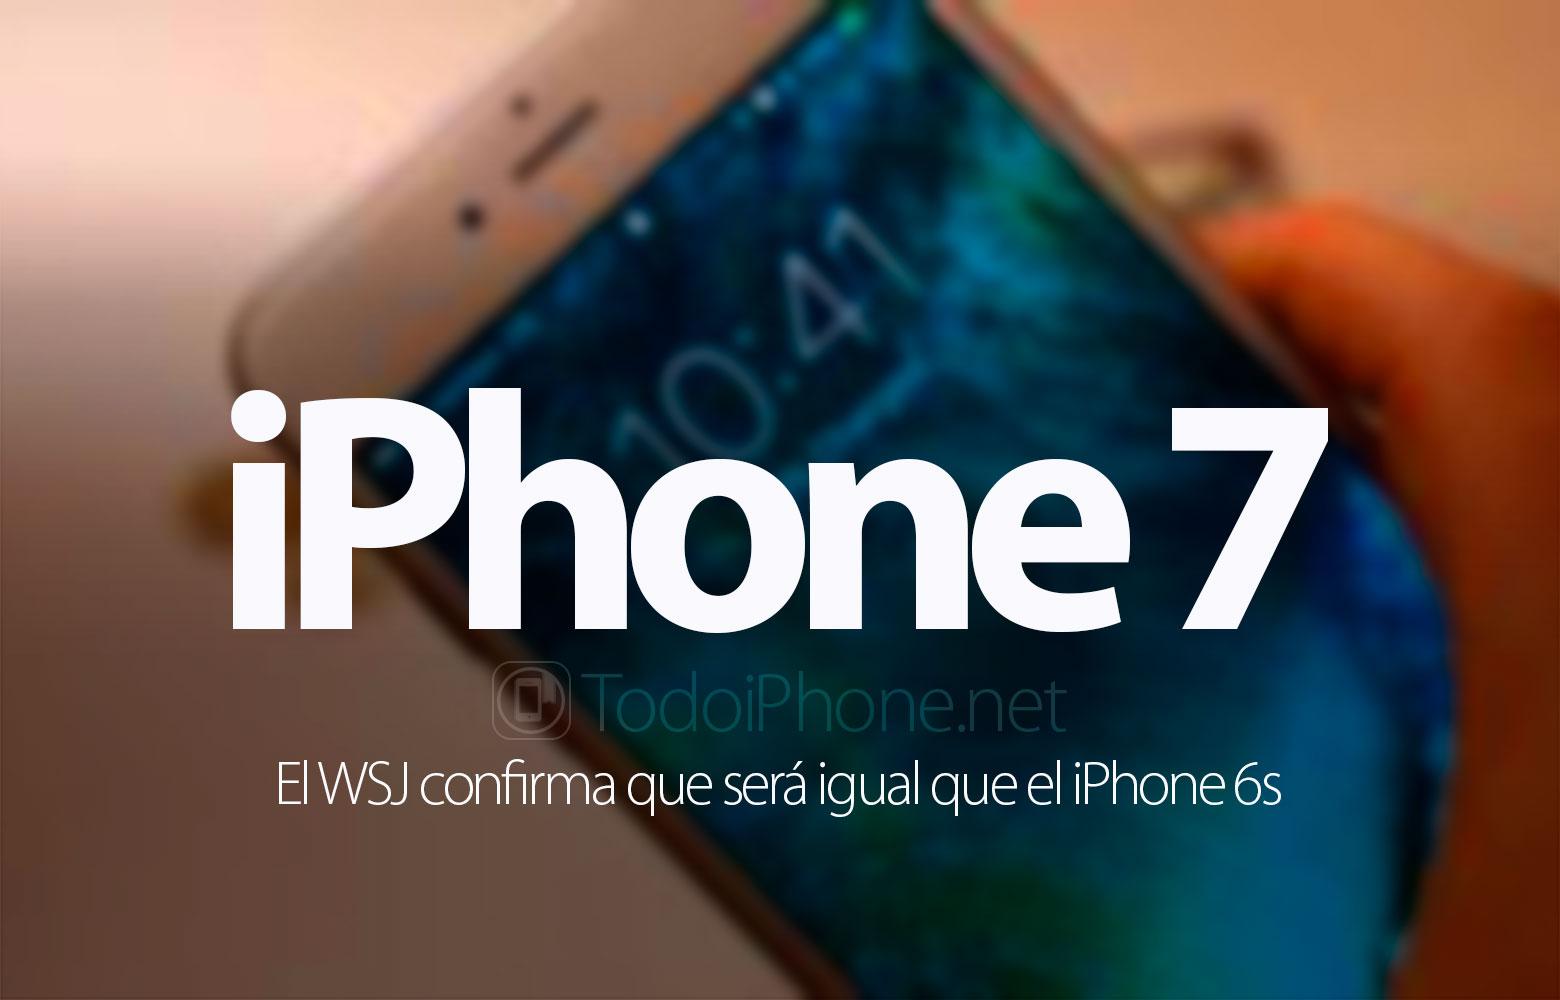 iphone-7-wsj-confirma-similar-iphone-6s